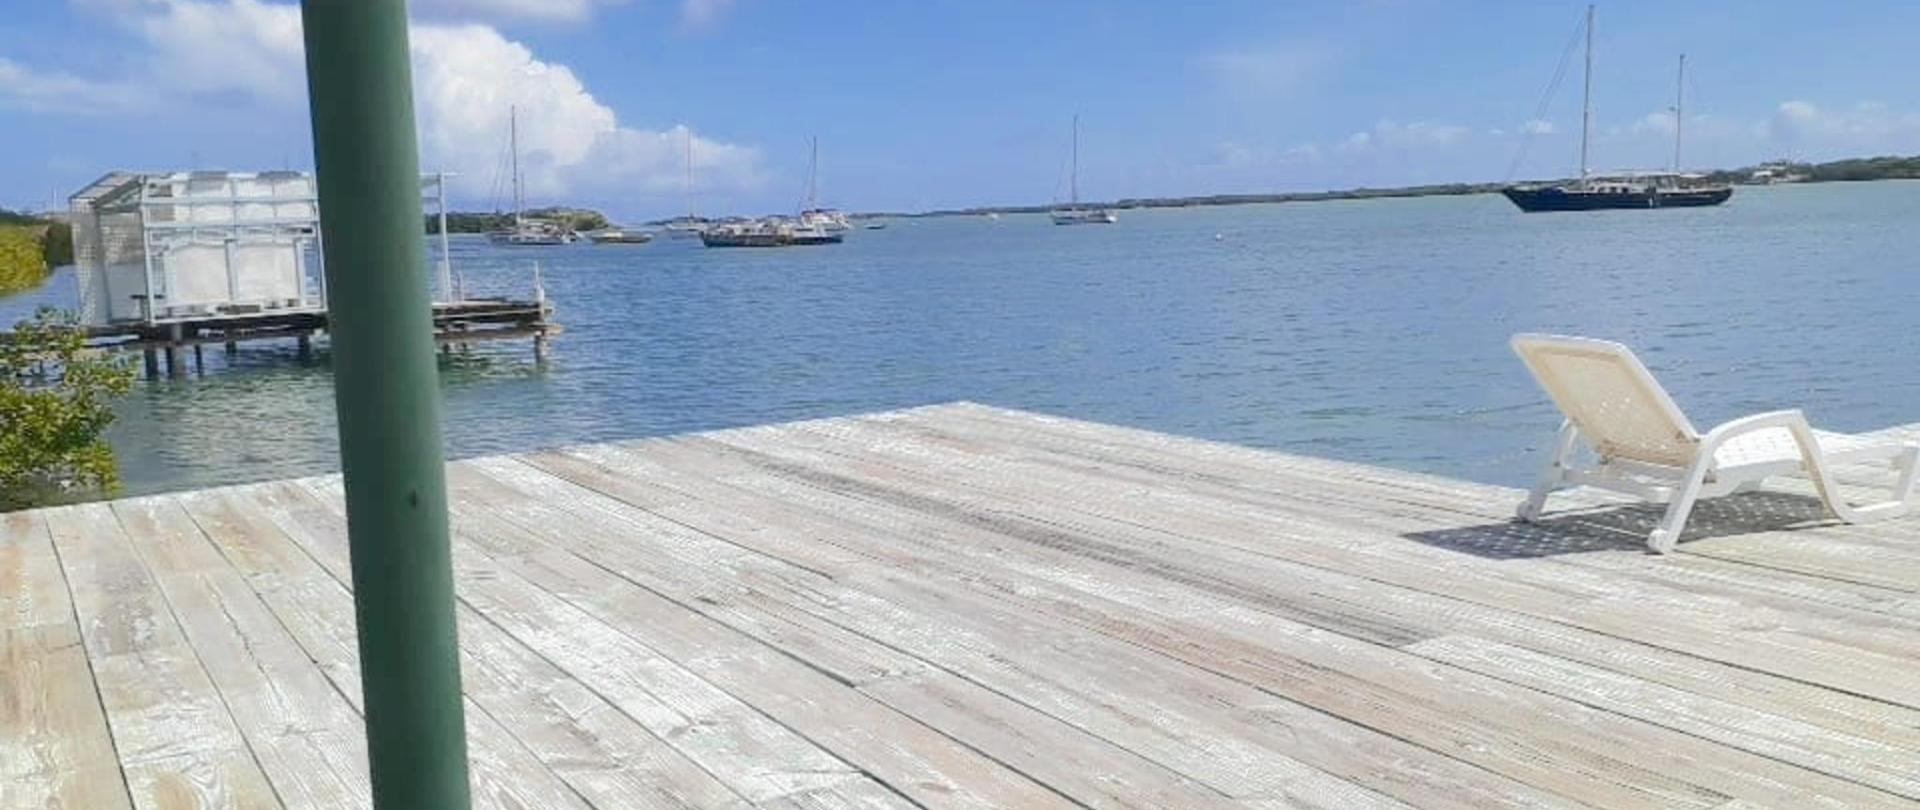 Pierdeck Vistalmar Aruba Accommodation.jpg